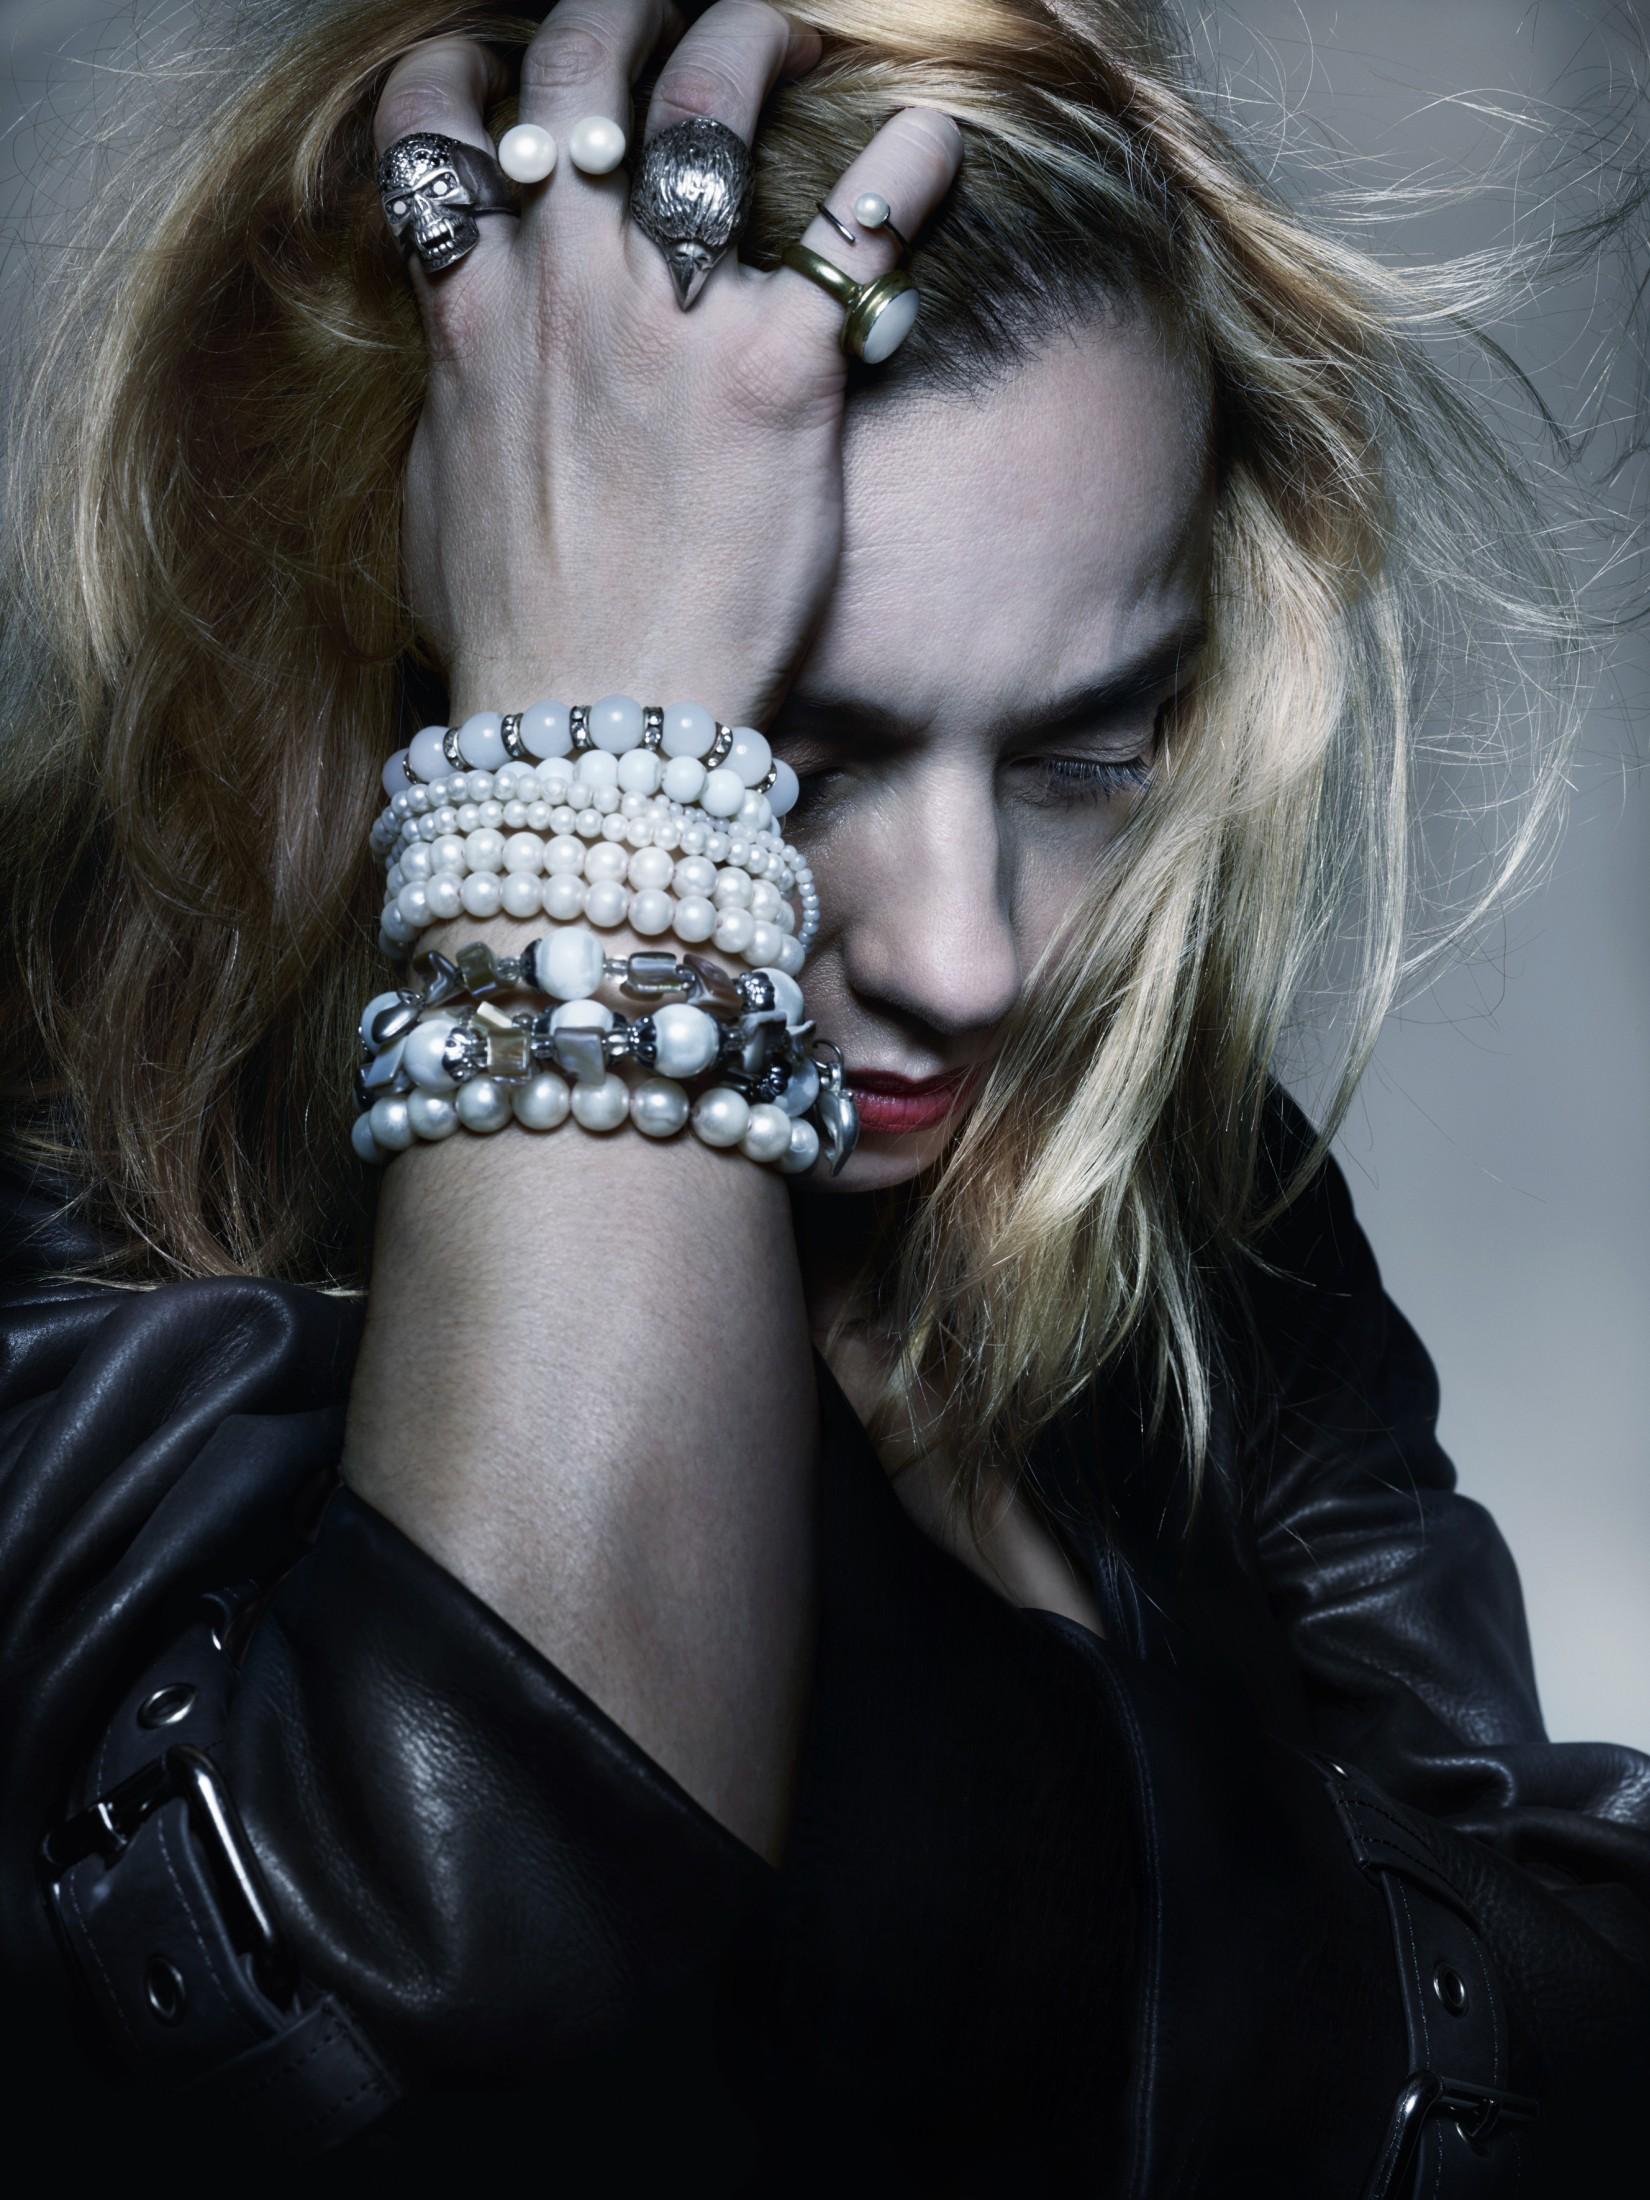 To πορτραίτο της Λένας Κιτσοπούλου έχει την υπογραφή του διάσημου Βρετανού φωτογράφου Nick Knight και του SHOWstudio.